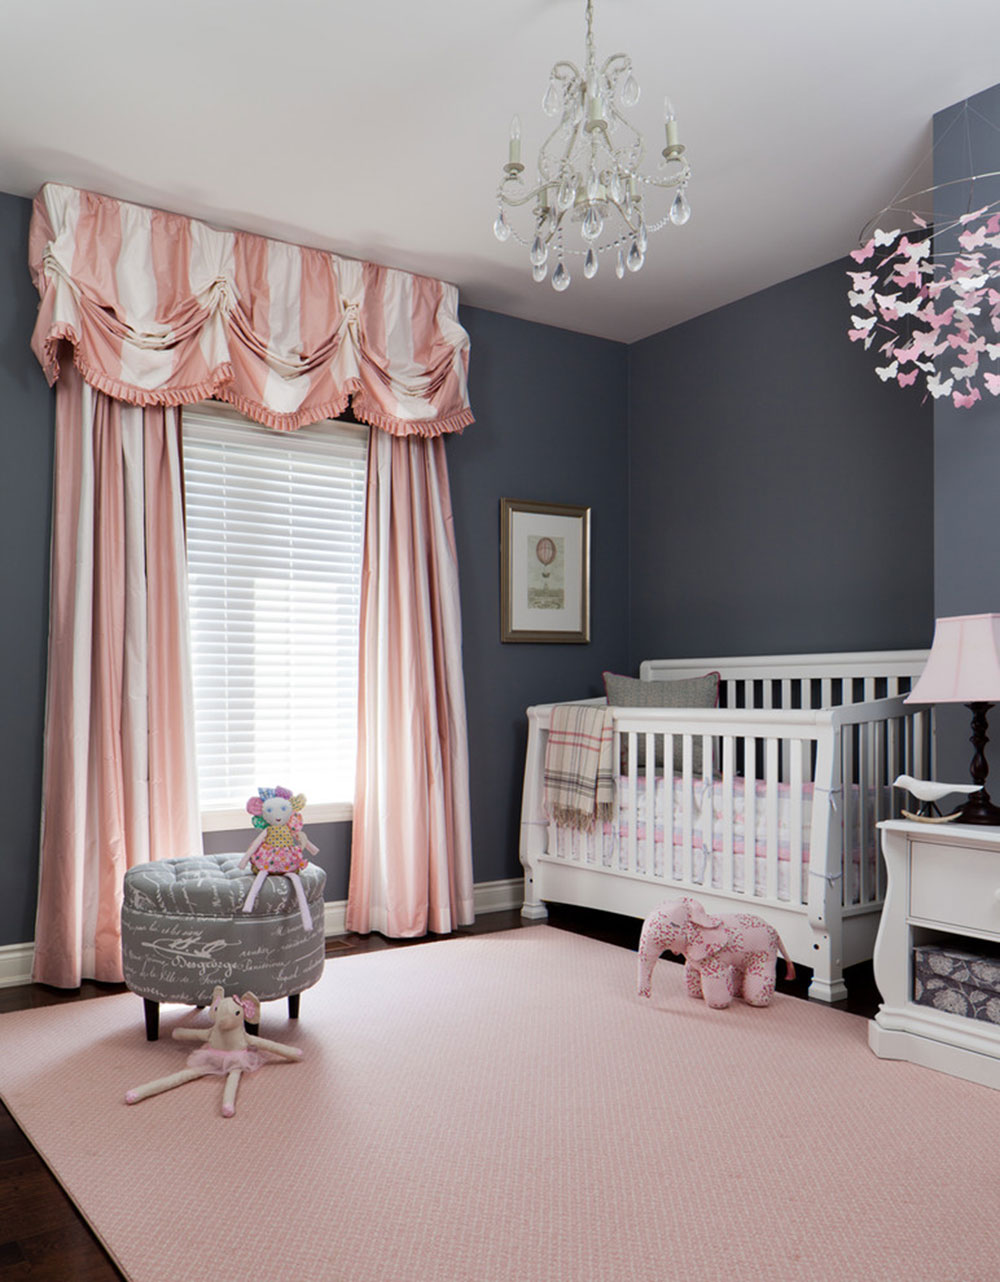 Amazing interiors with shades of gray4 Amazing interiors with shades of gray